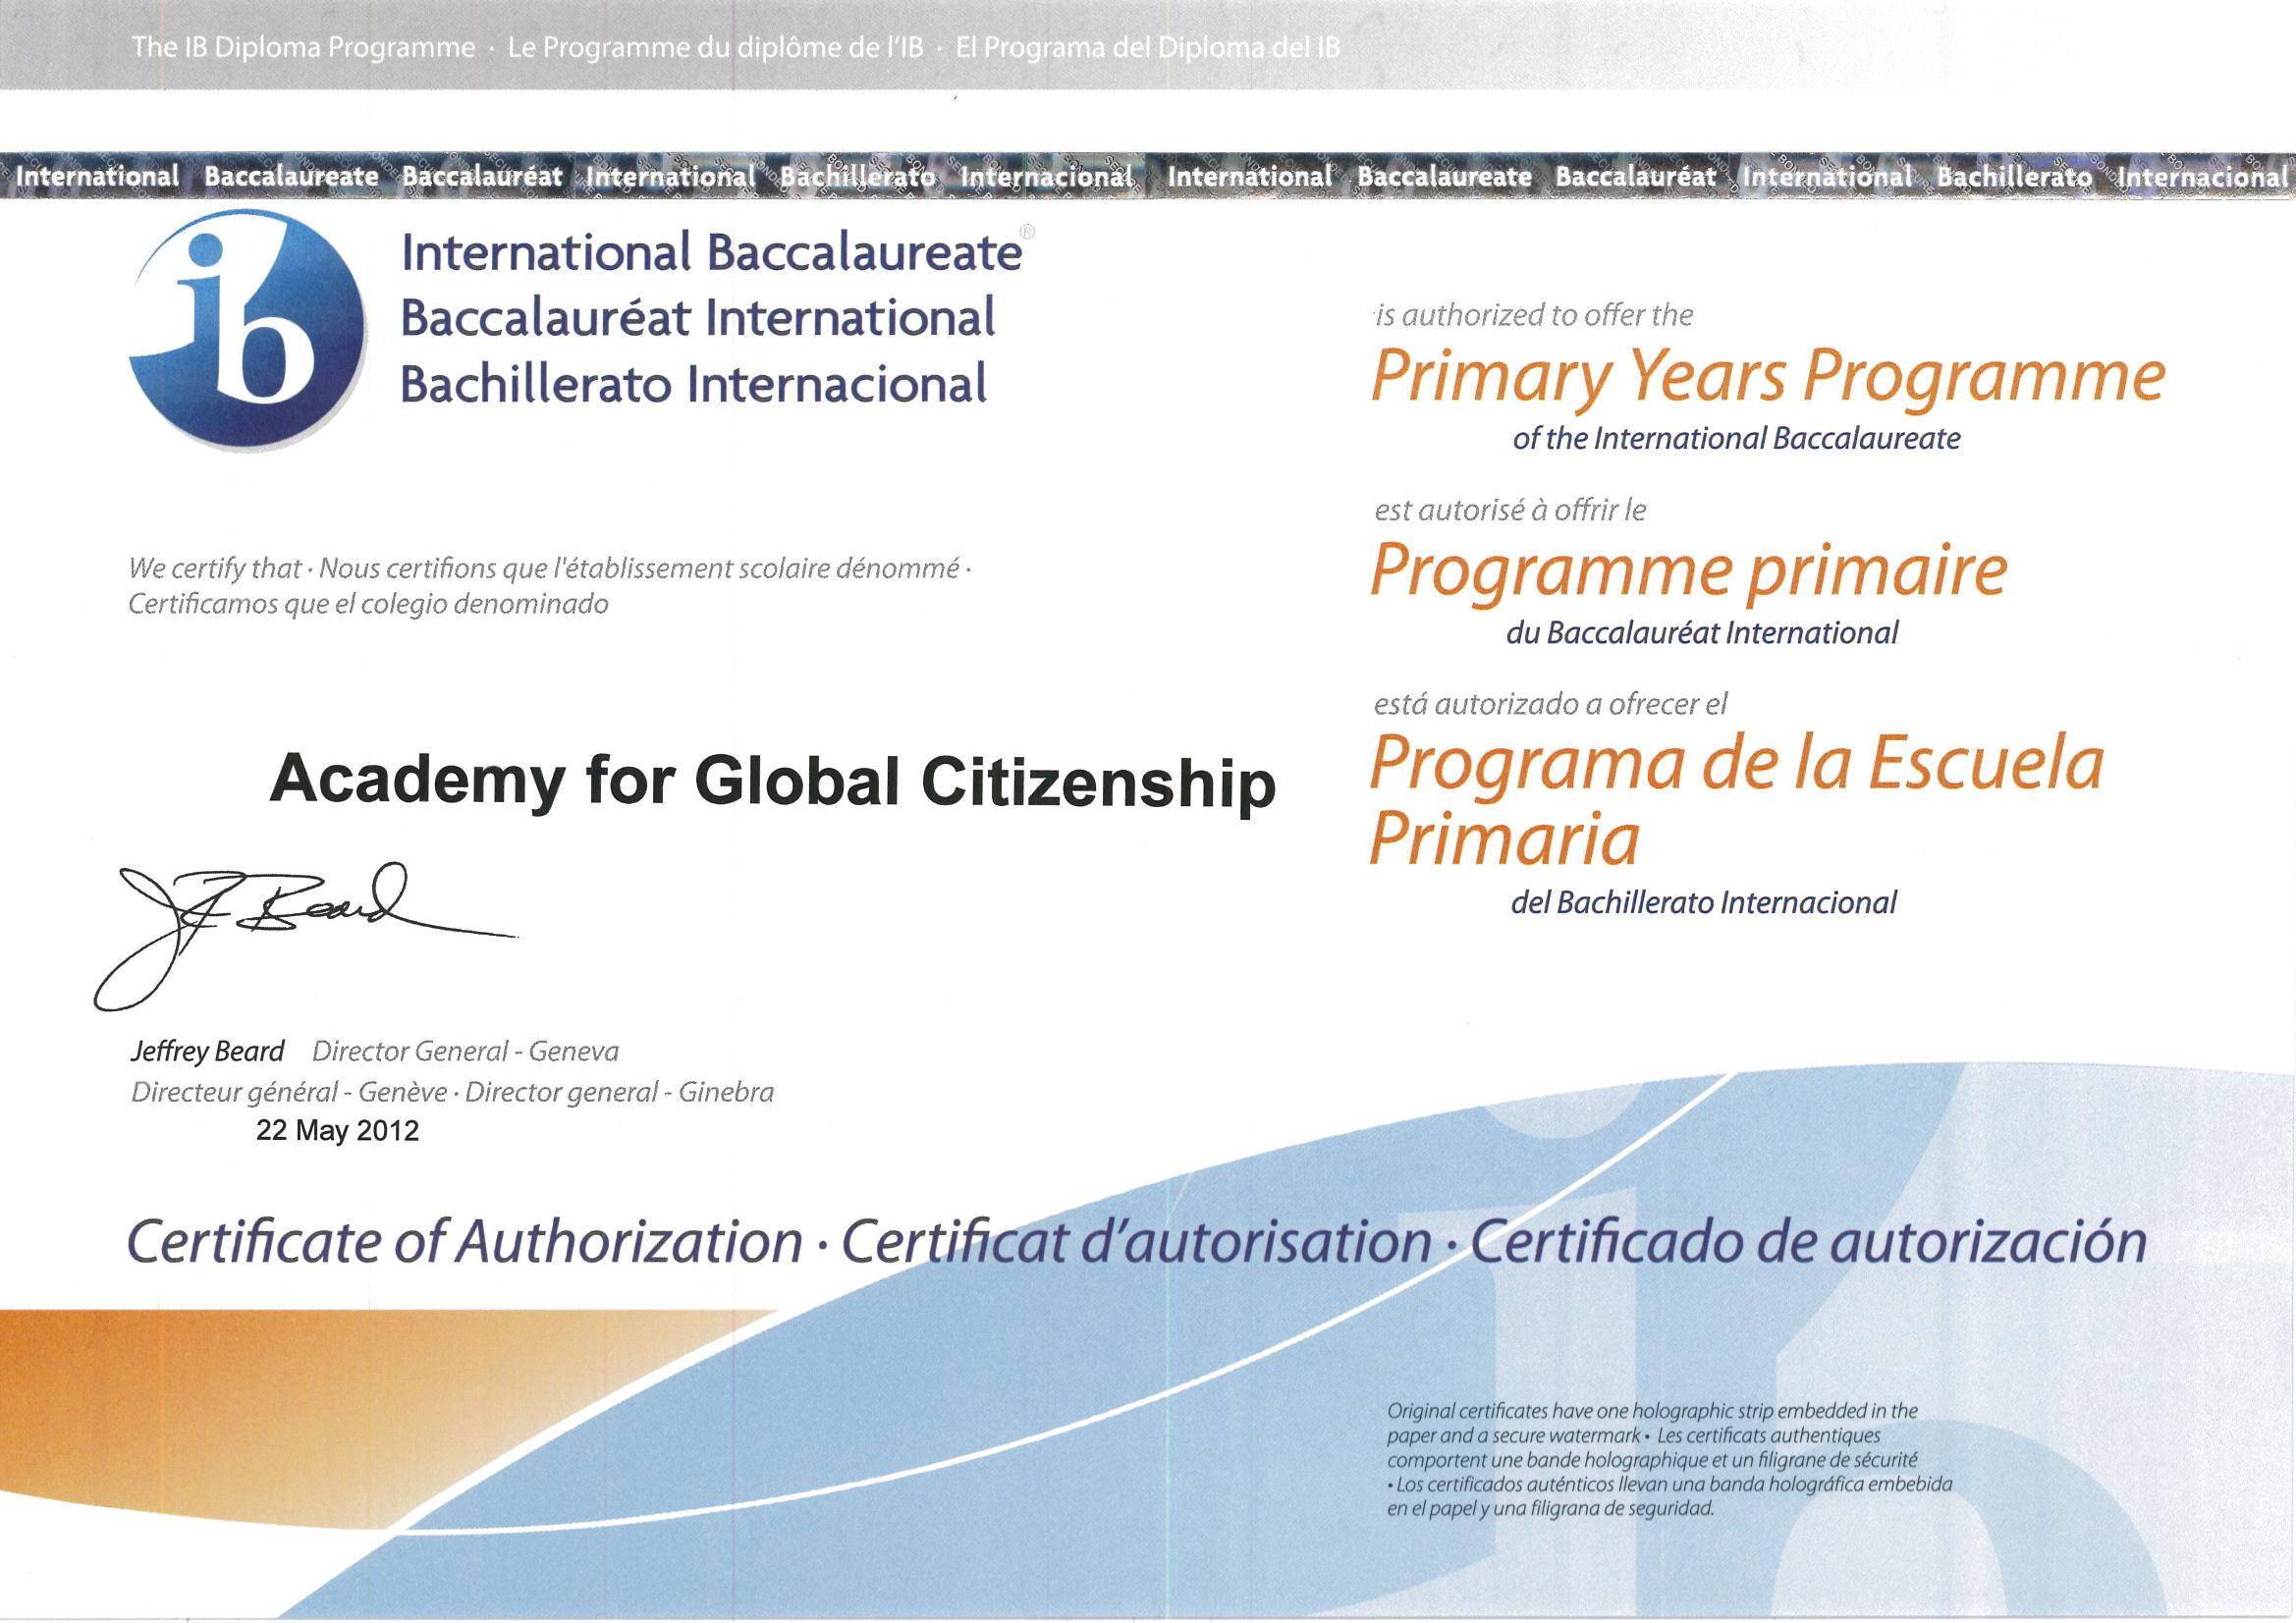 What is the International Baccalaureate(IB) program like?